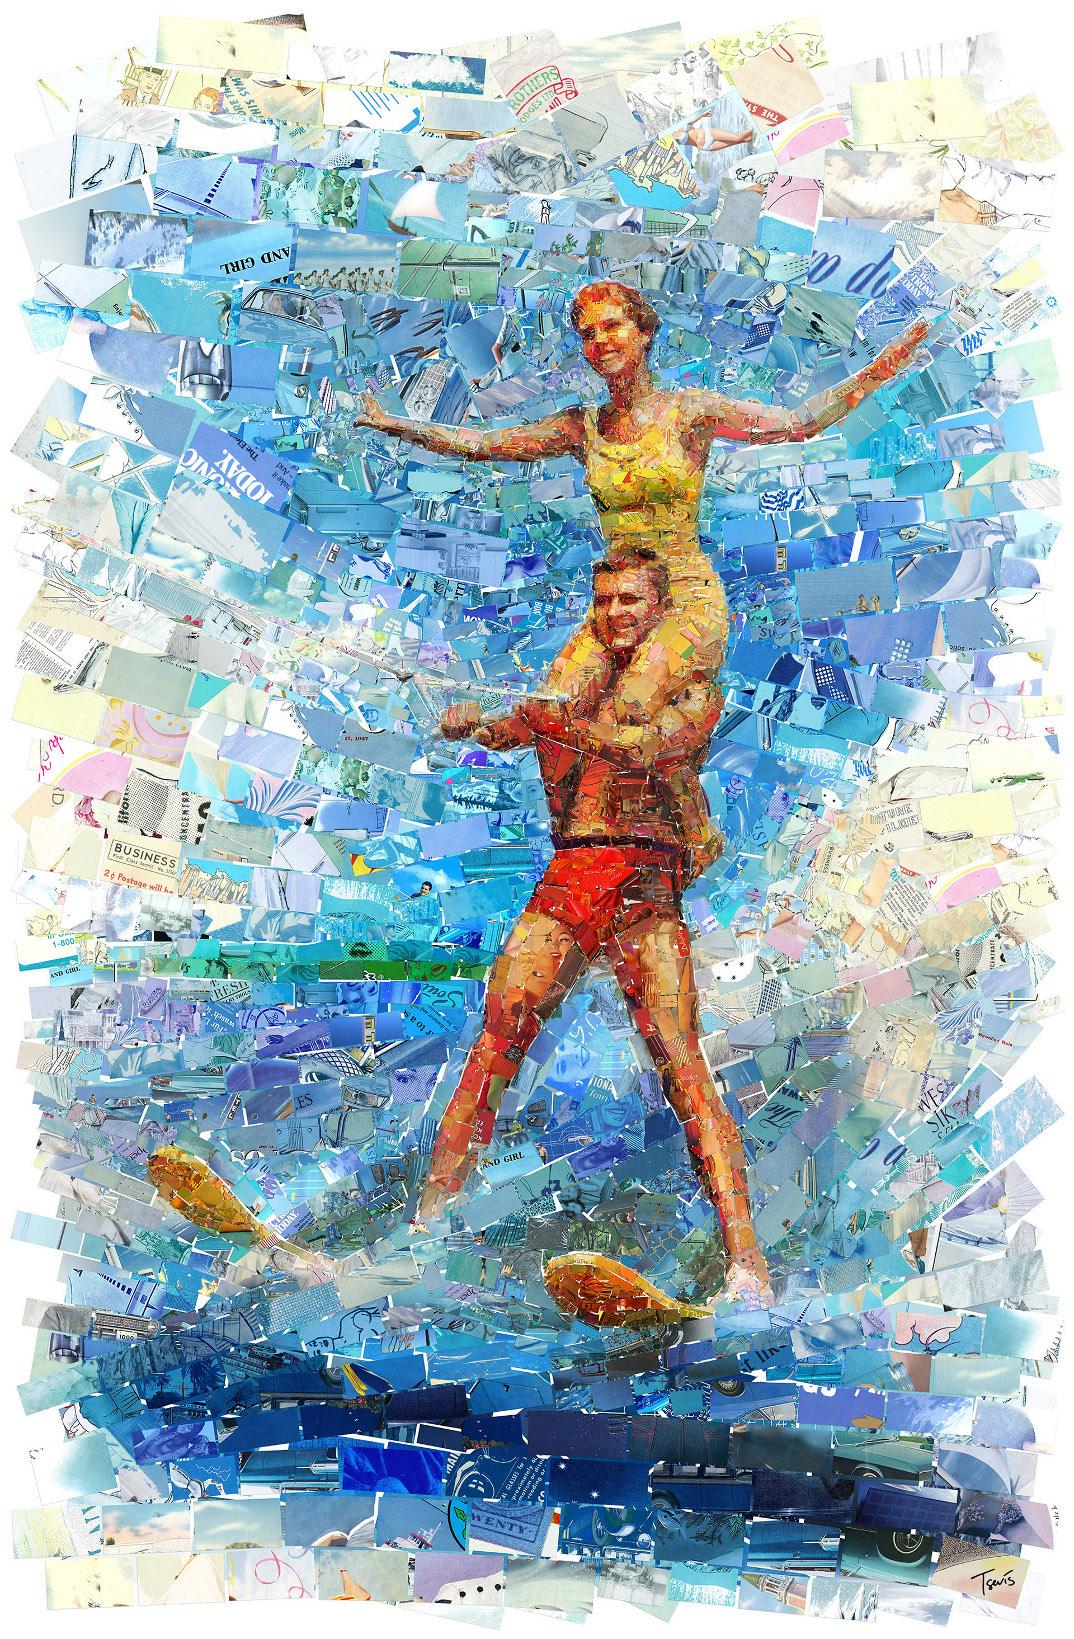 mosaici-collage-riviste-anni-50-60-endless-summer-charis-tsevis-03